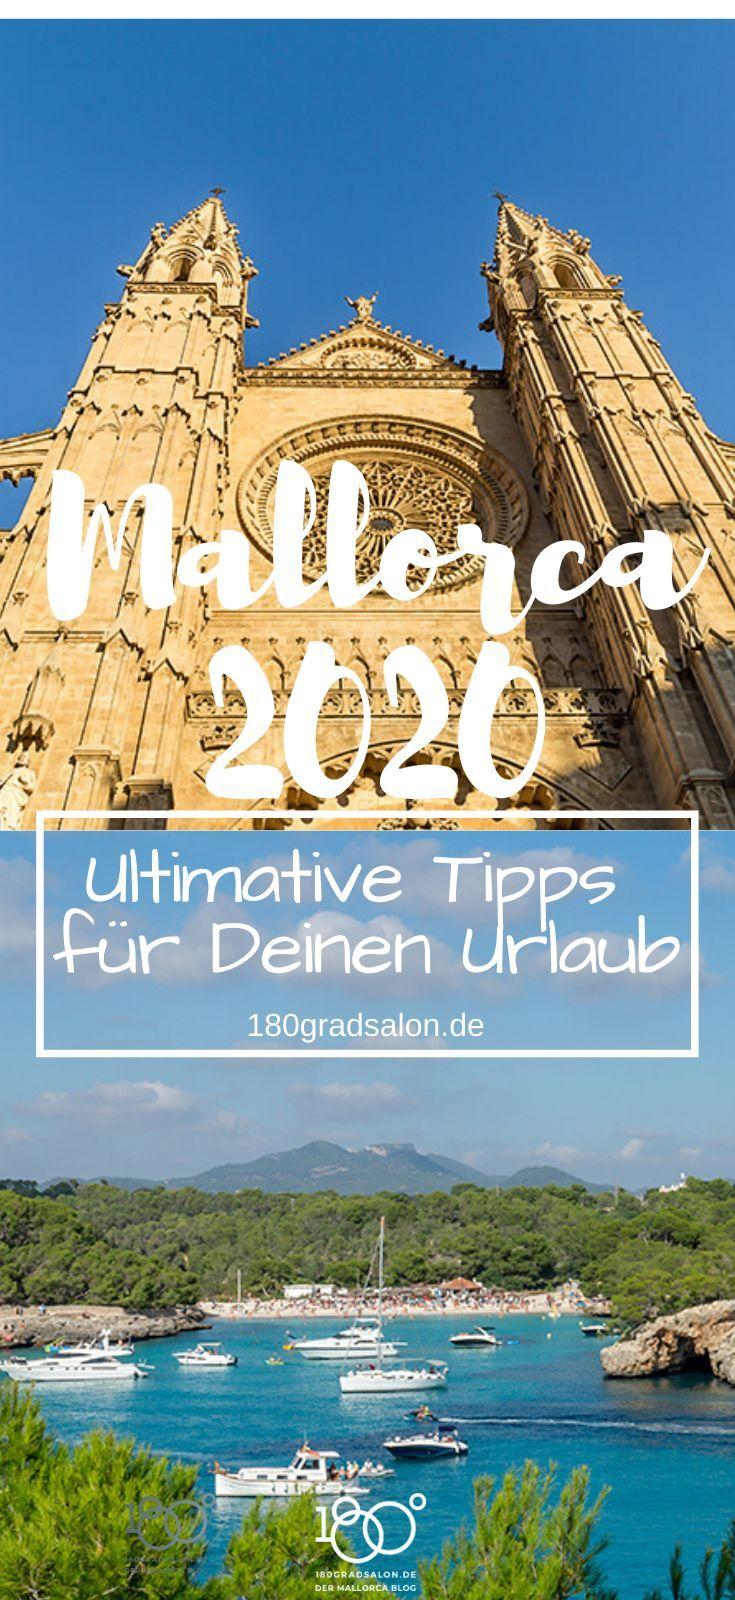 Mallorca Urlaub 2020 Meine 6 Besten Tipps Fur Dich Mallorca